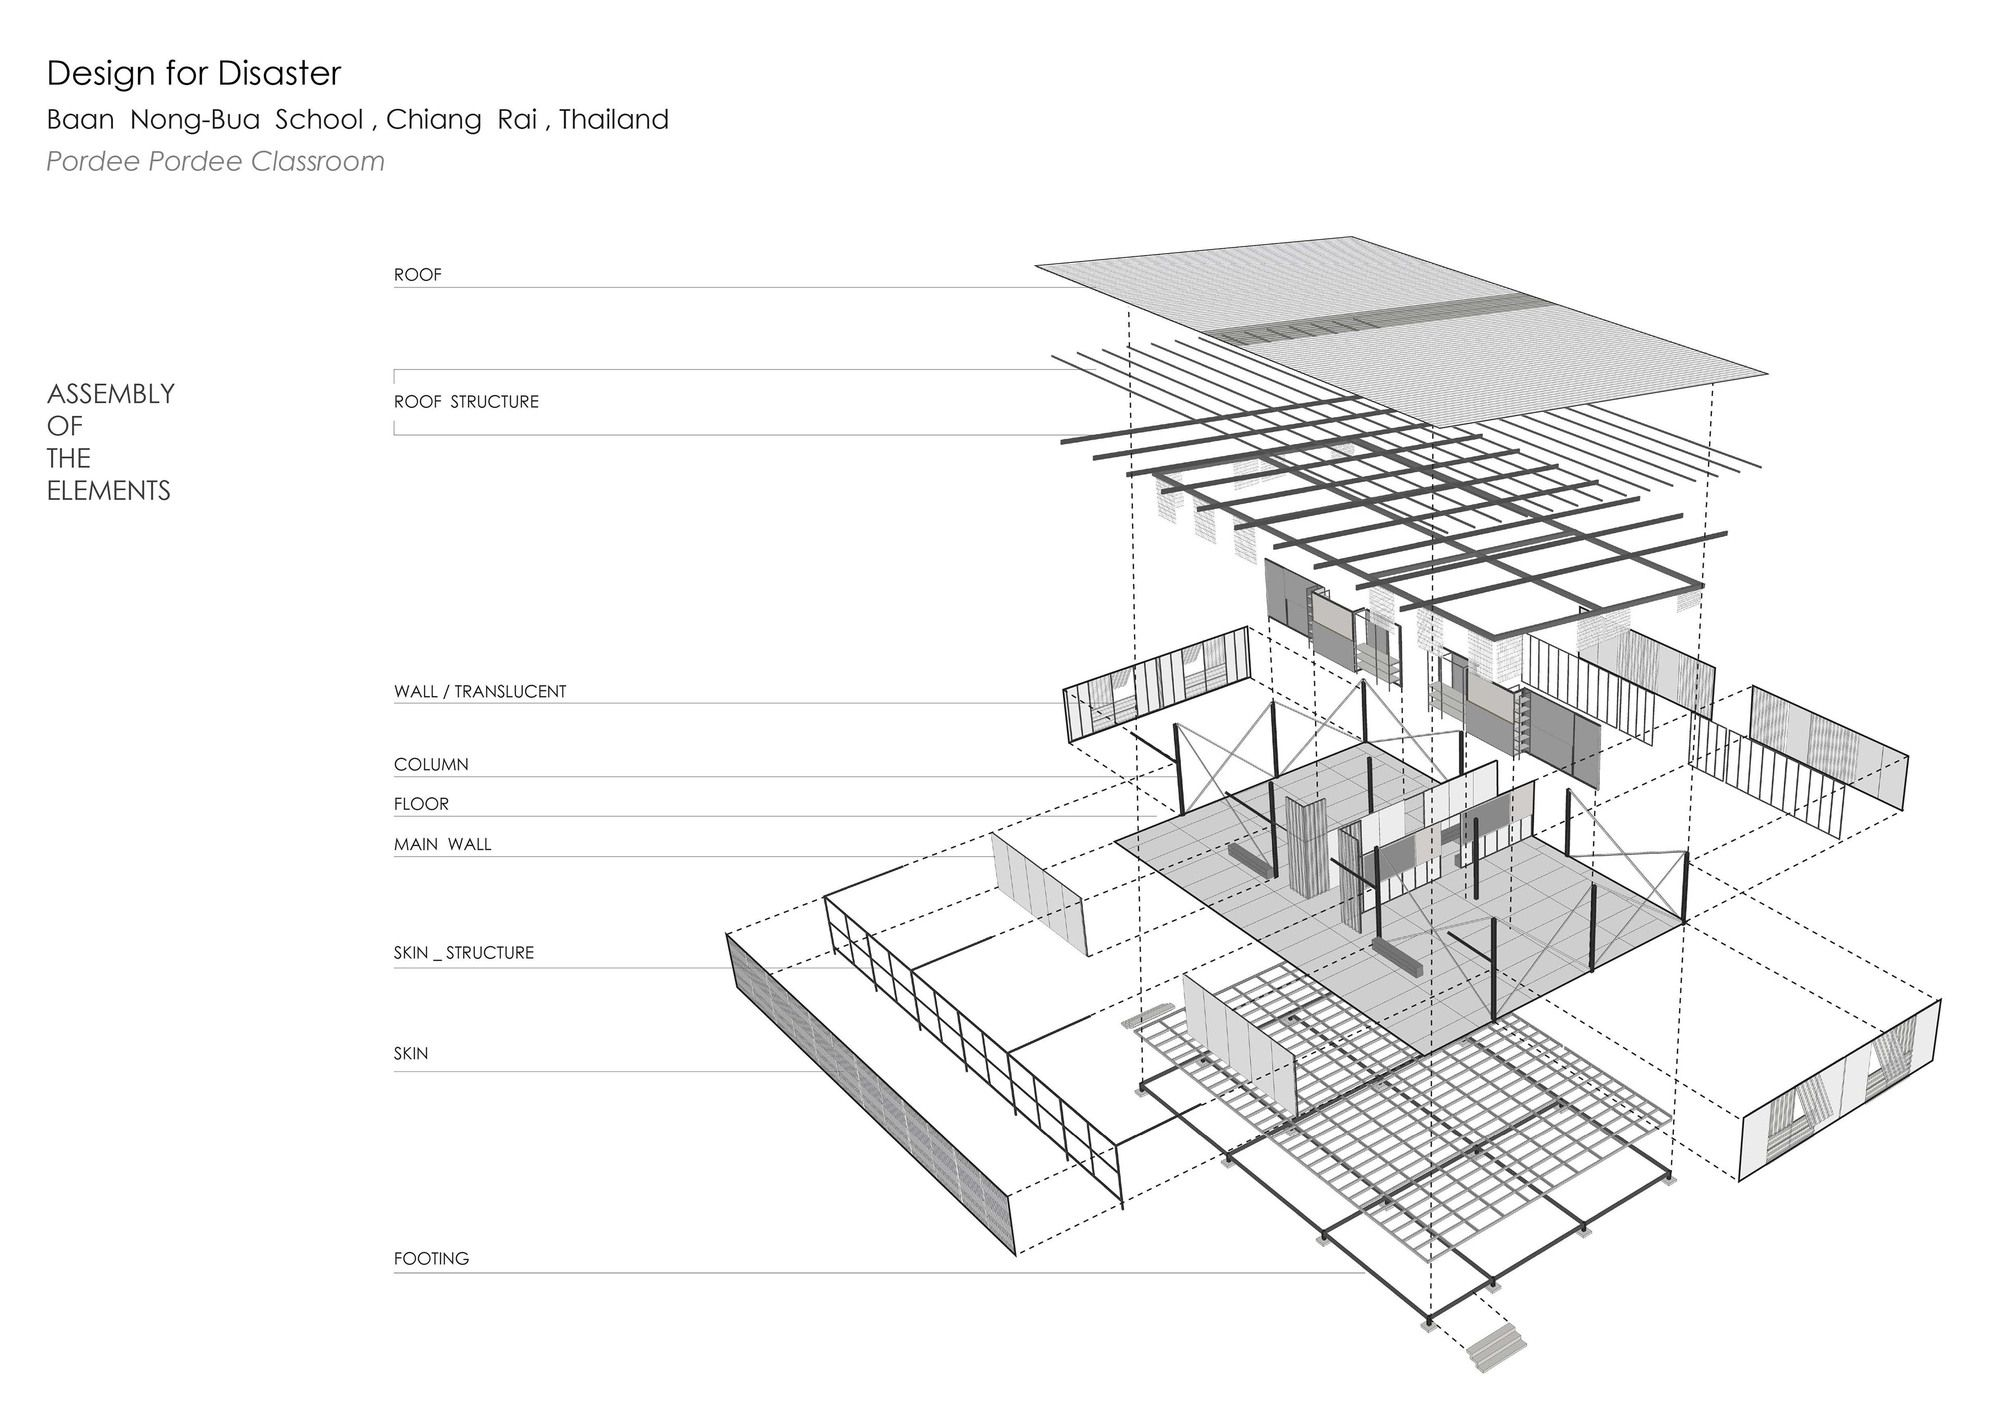 Gallery Of Baan Nong Bua School Junsekino Architect And Design 19 Diagram Architecture Tectonic Architecture Architecture Presentation